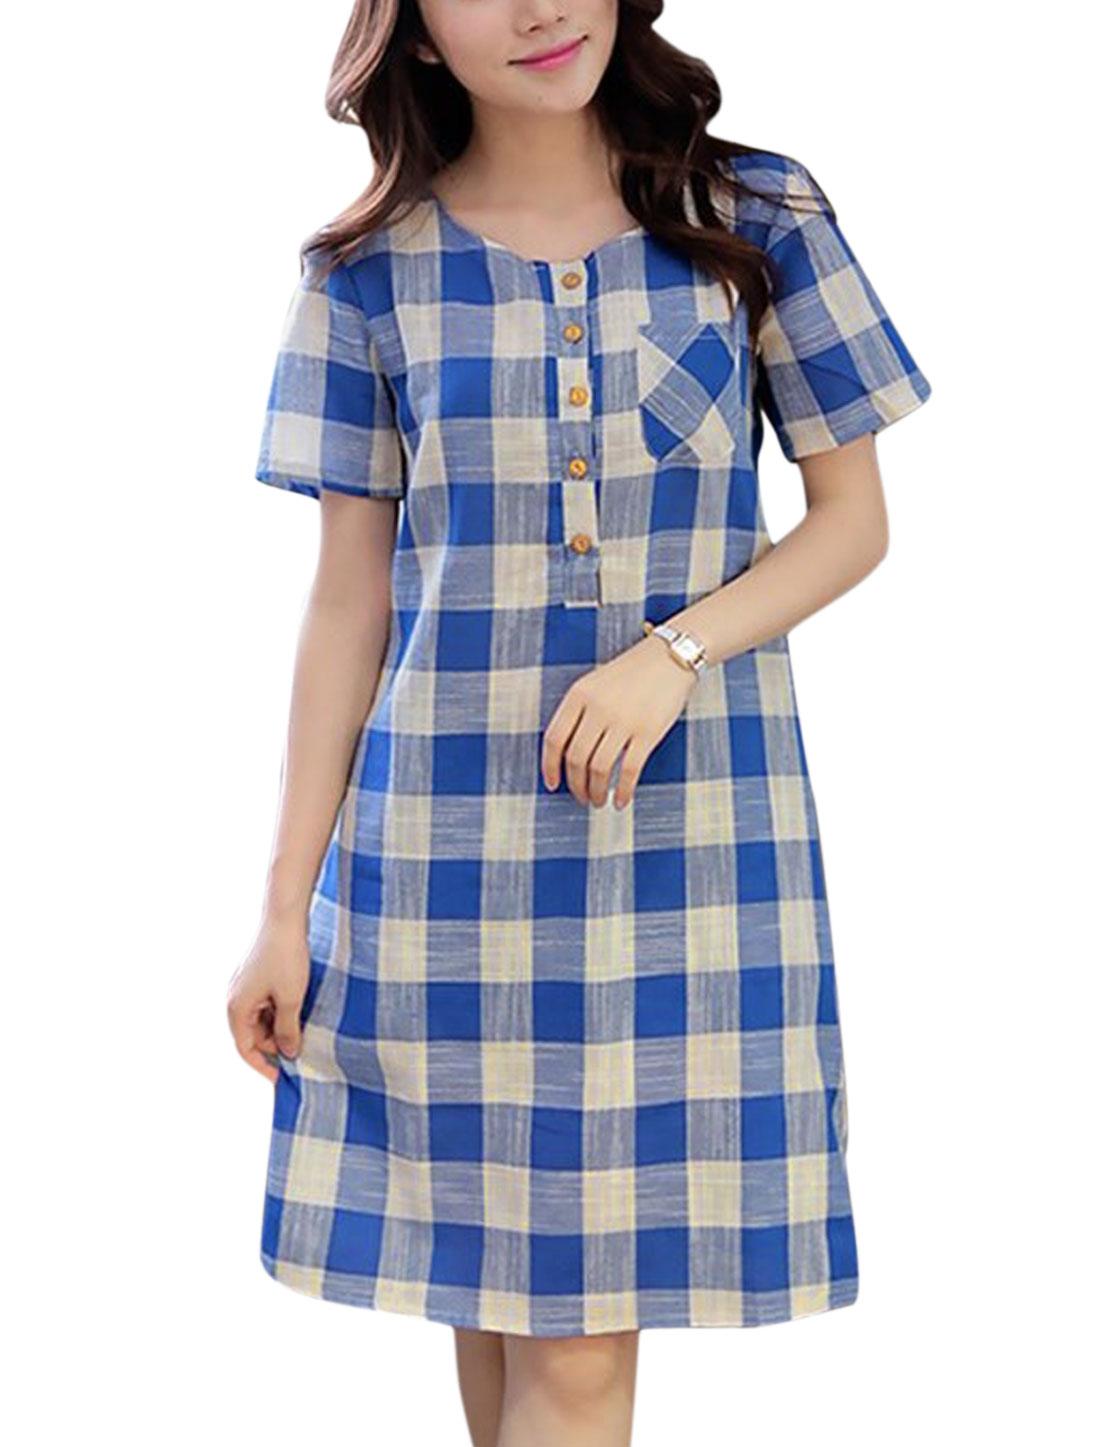 Women Checks Four-Button Placket Short Sleeves Tunic Dress Blue Whit